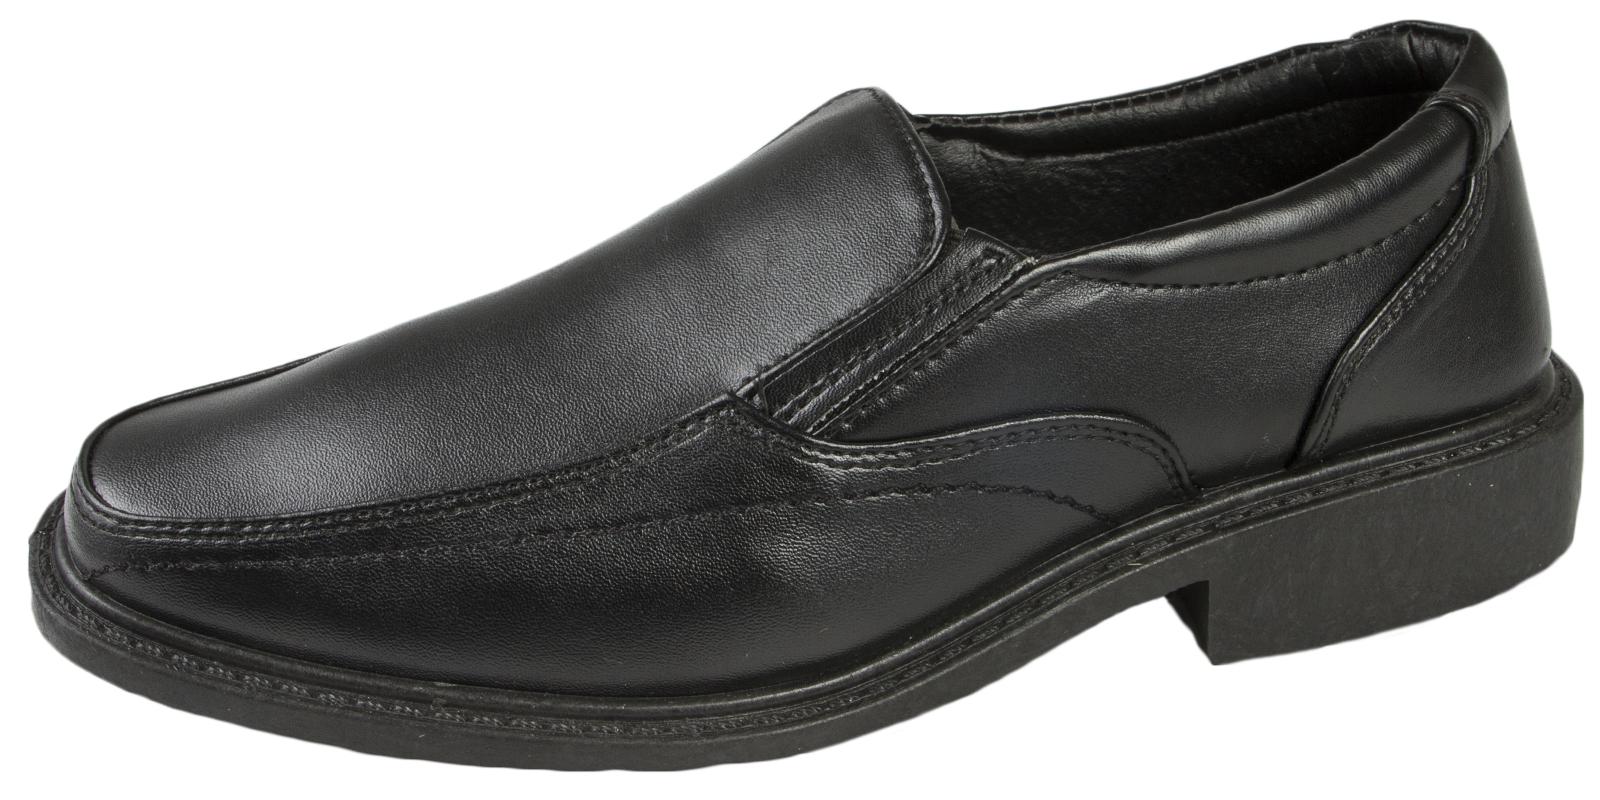 Black Faux Leather Formal Shoes